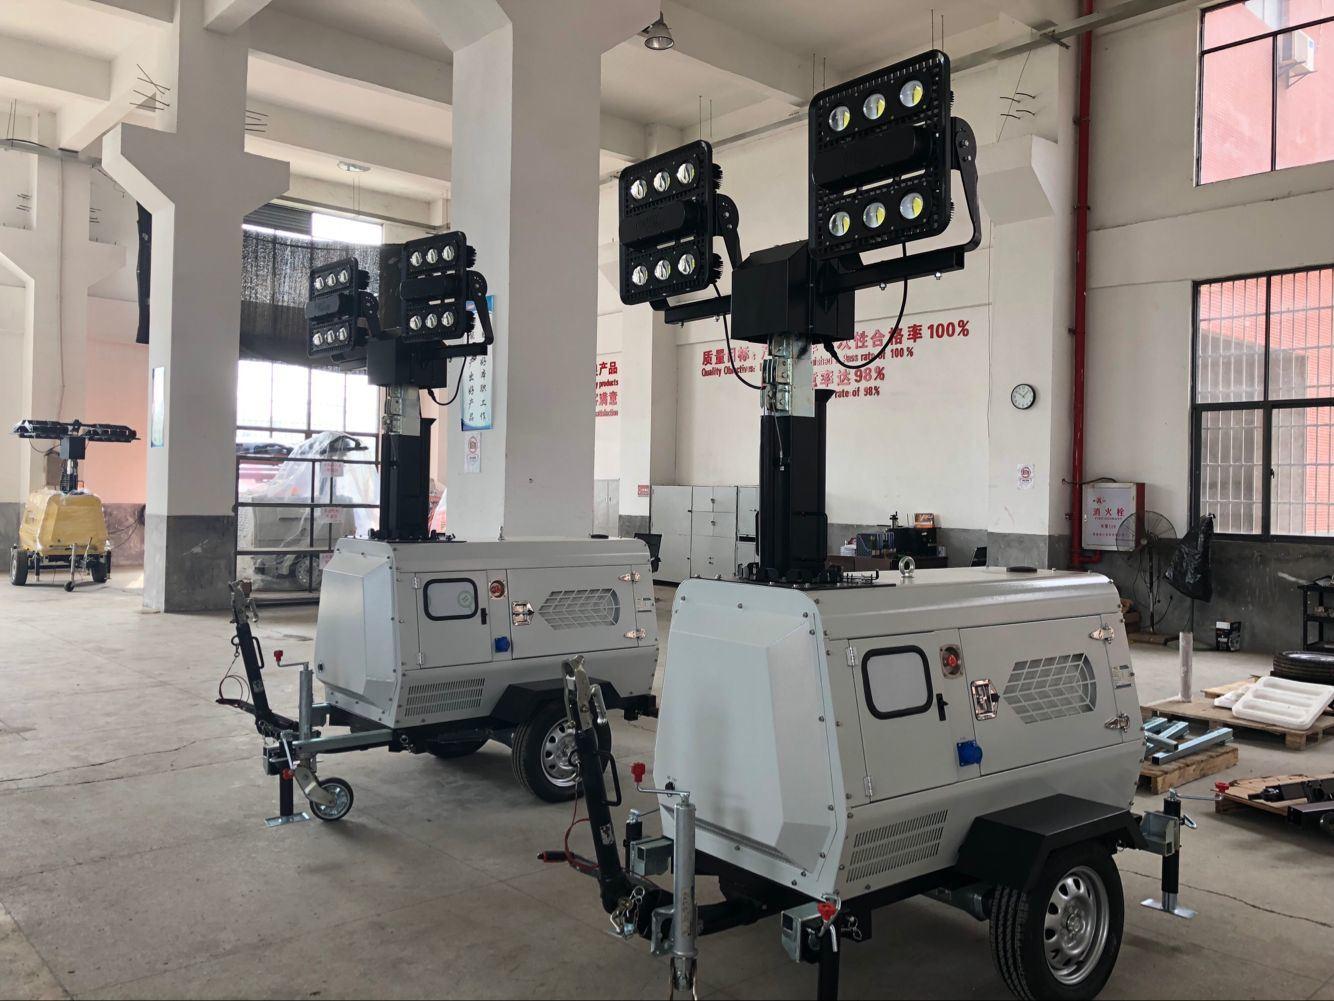 China 2 480w Led Hydraulic Vertical